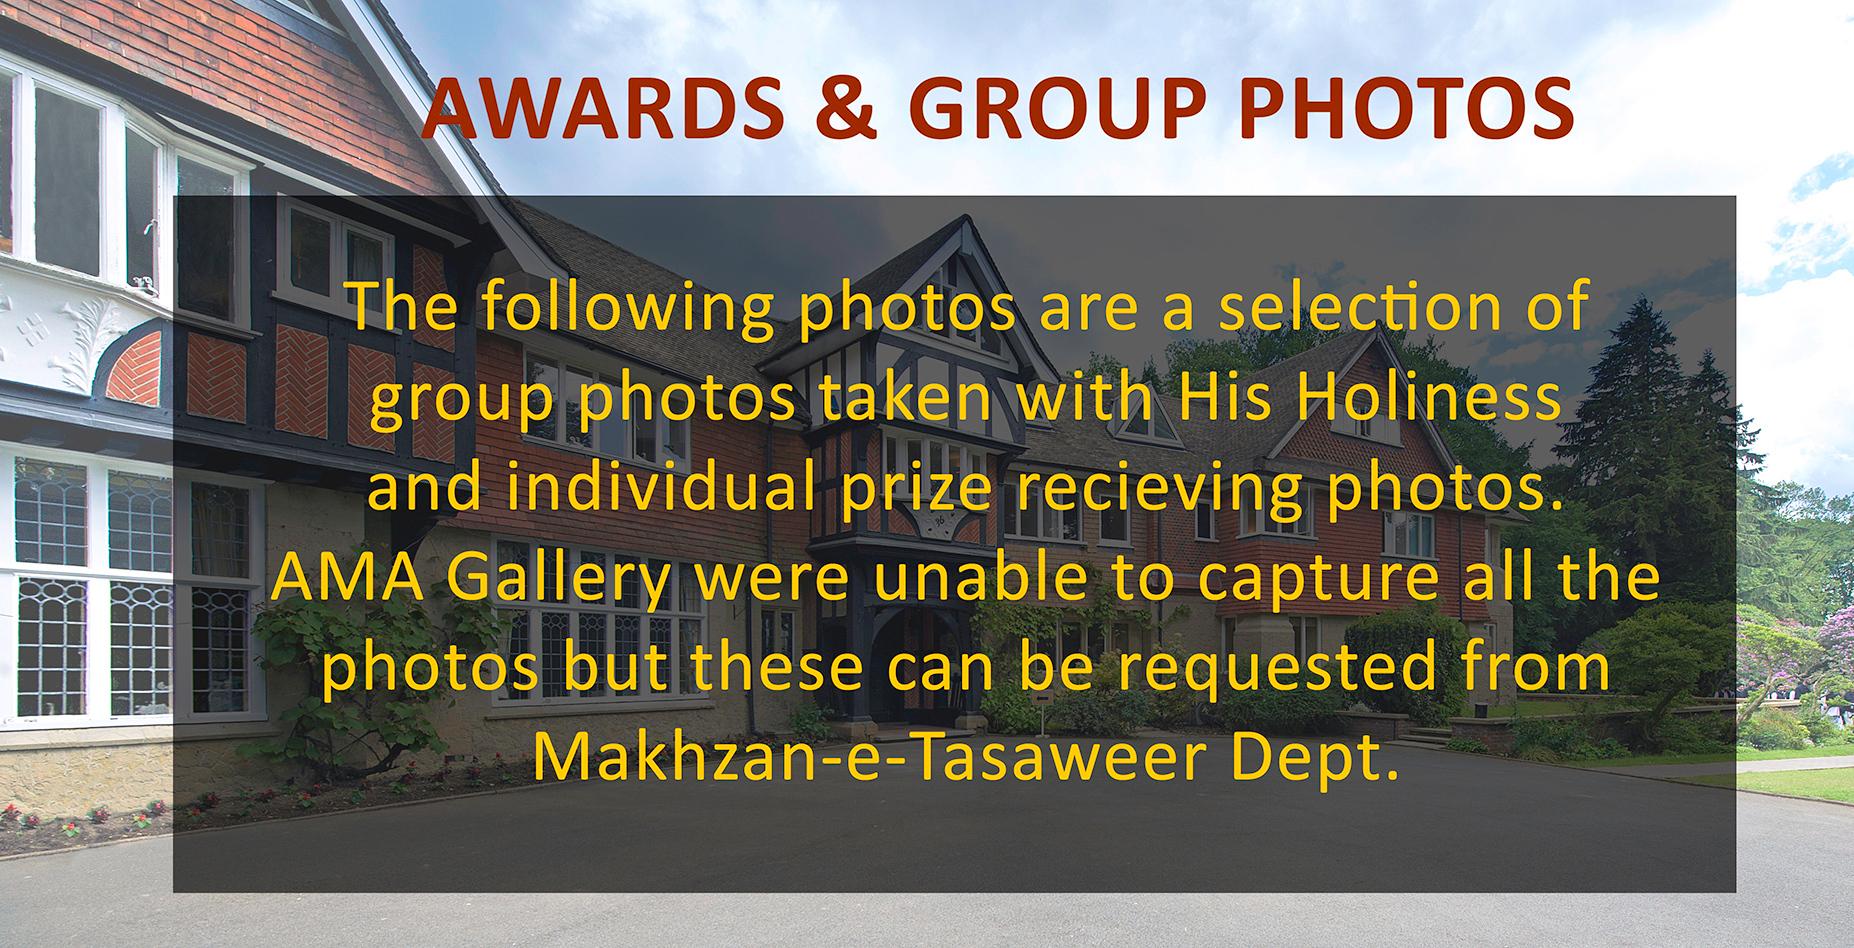 Awards Gallery